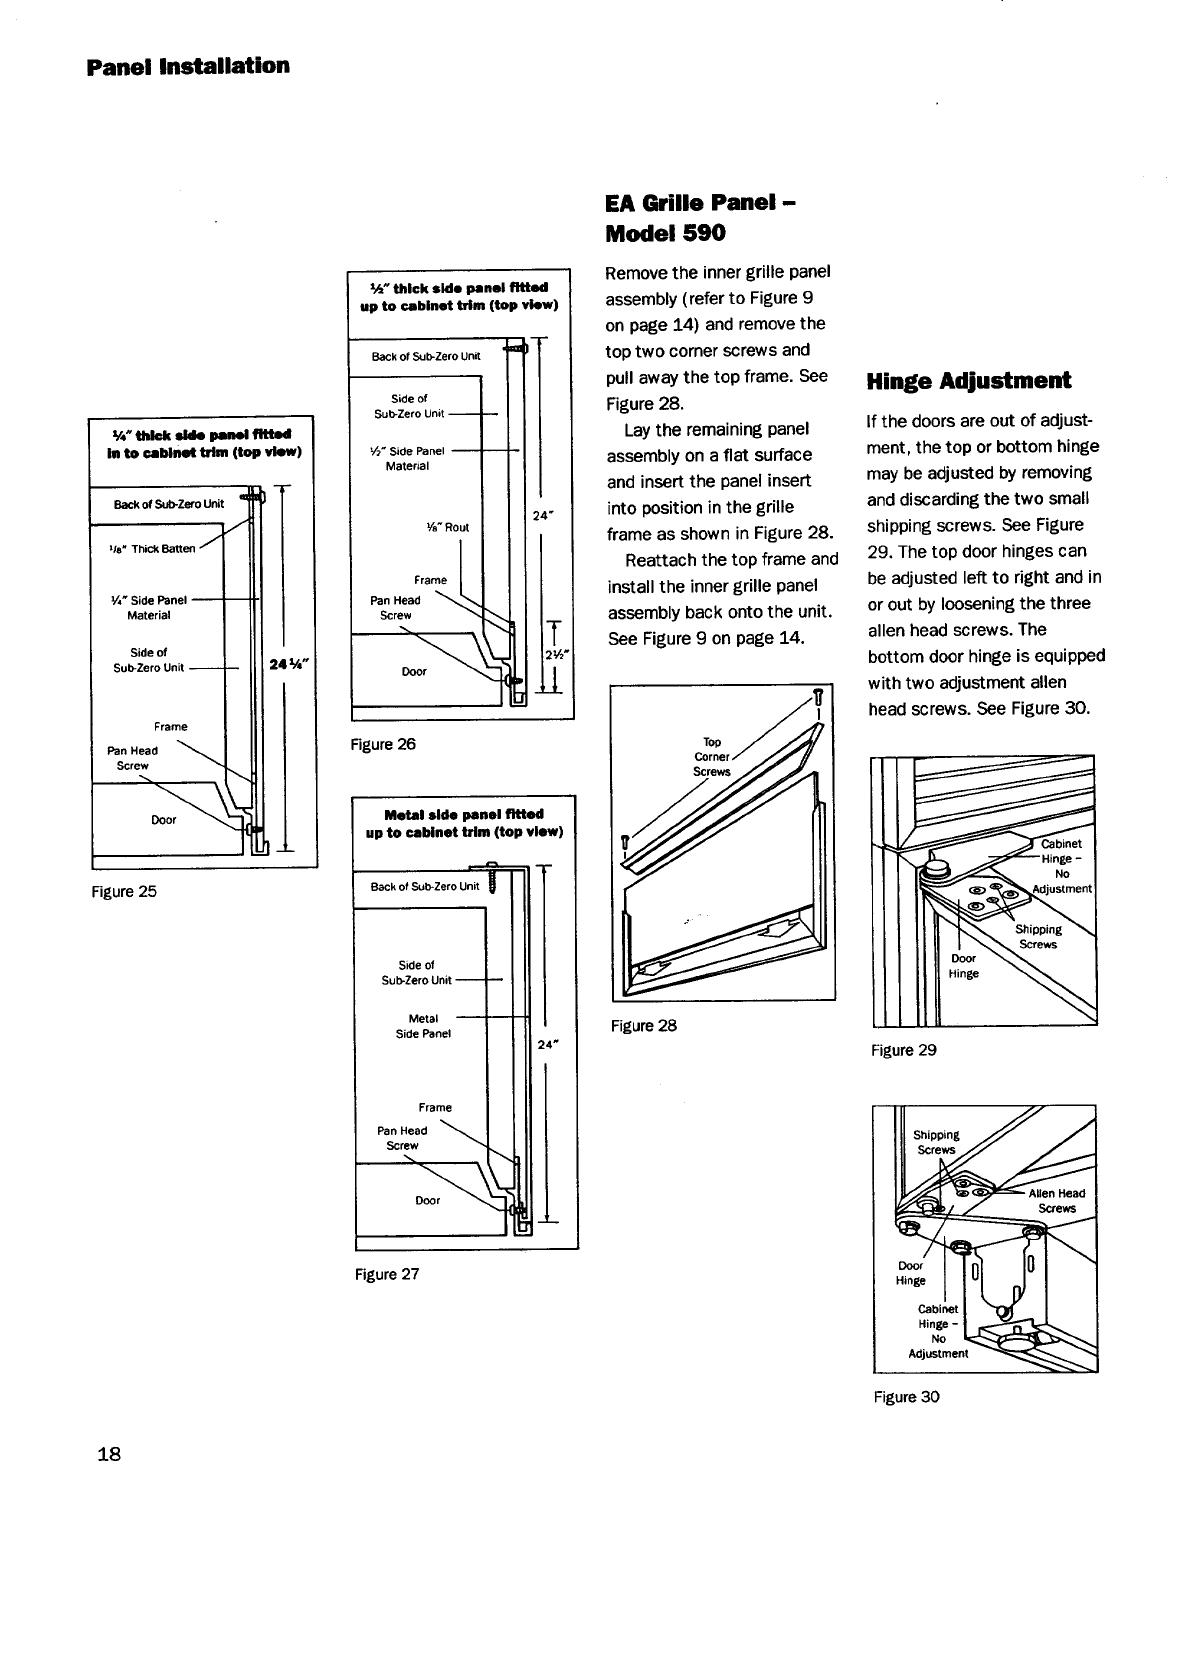 Sub Zero Wiring Diagrams 590 Diagram Virtual Fretboard